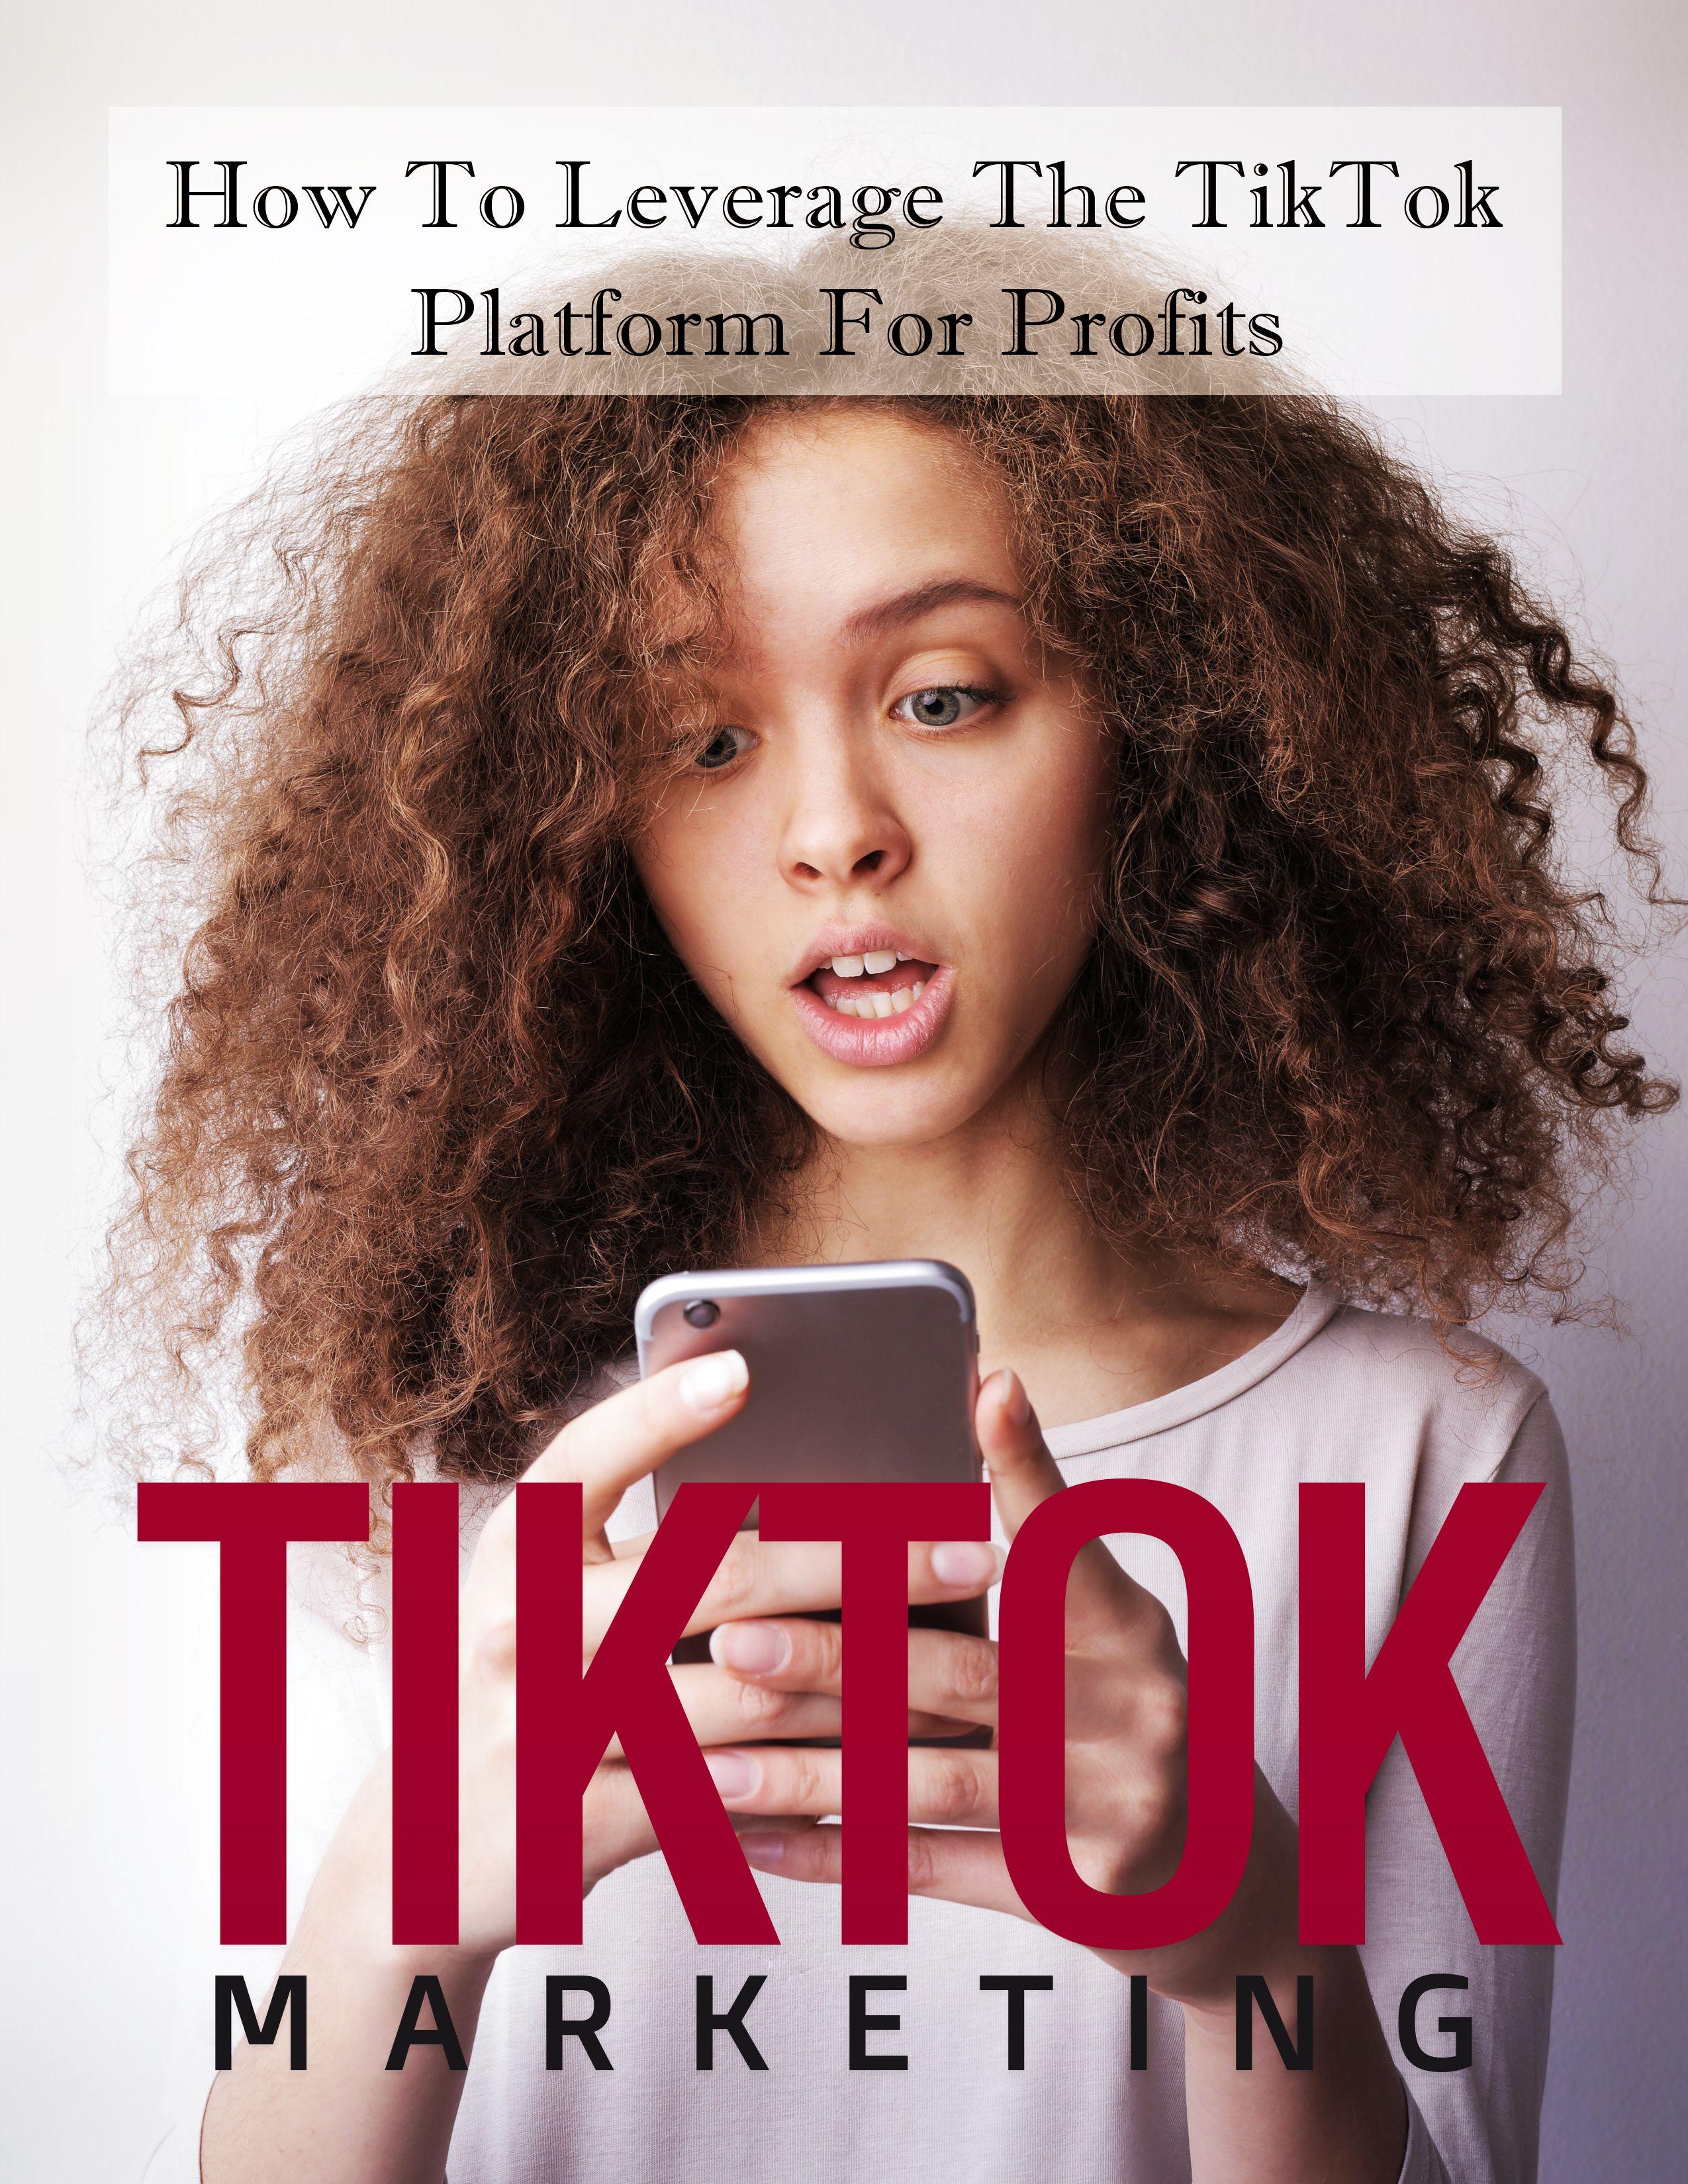 Tik Tok Marketing Marketing How To Use Hashtags Make Money Fast